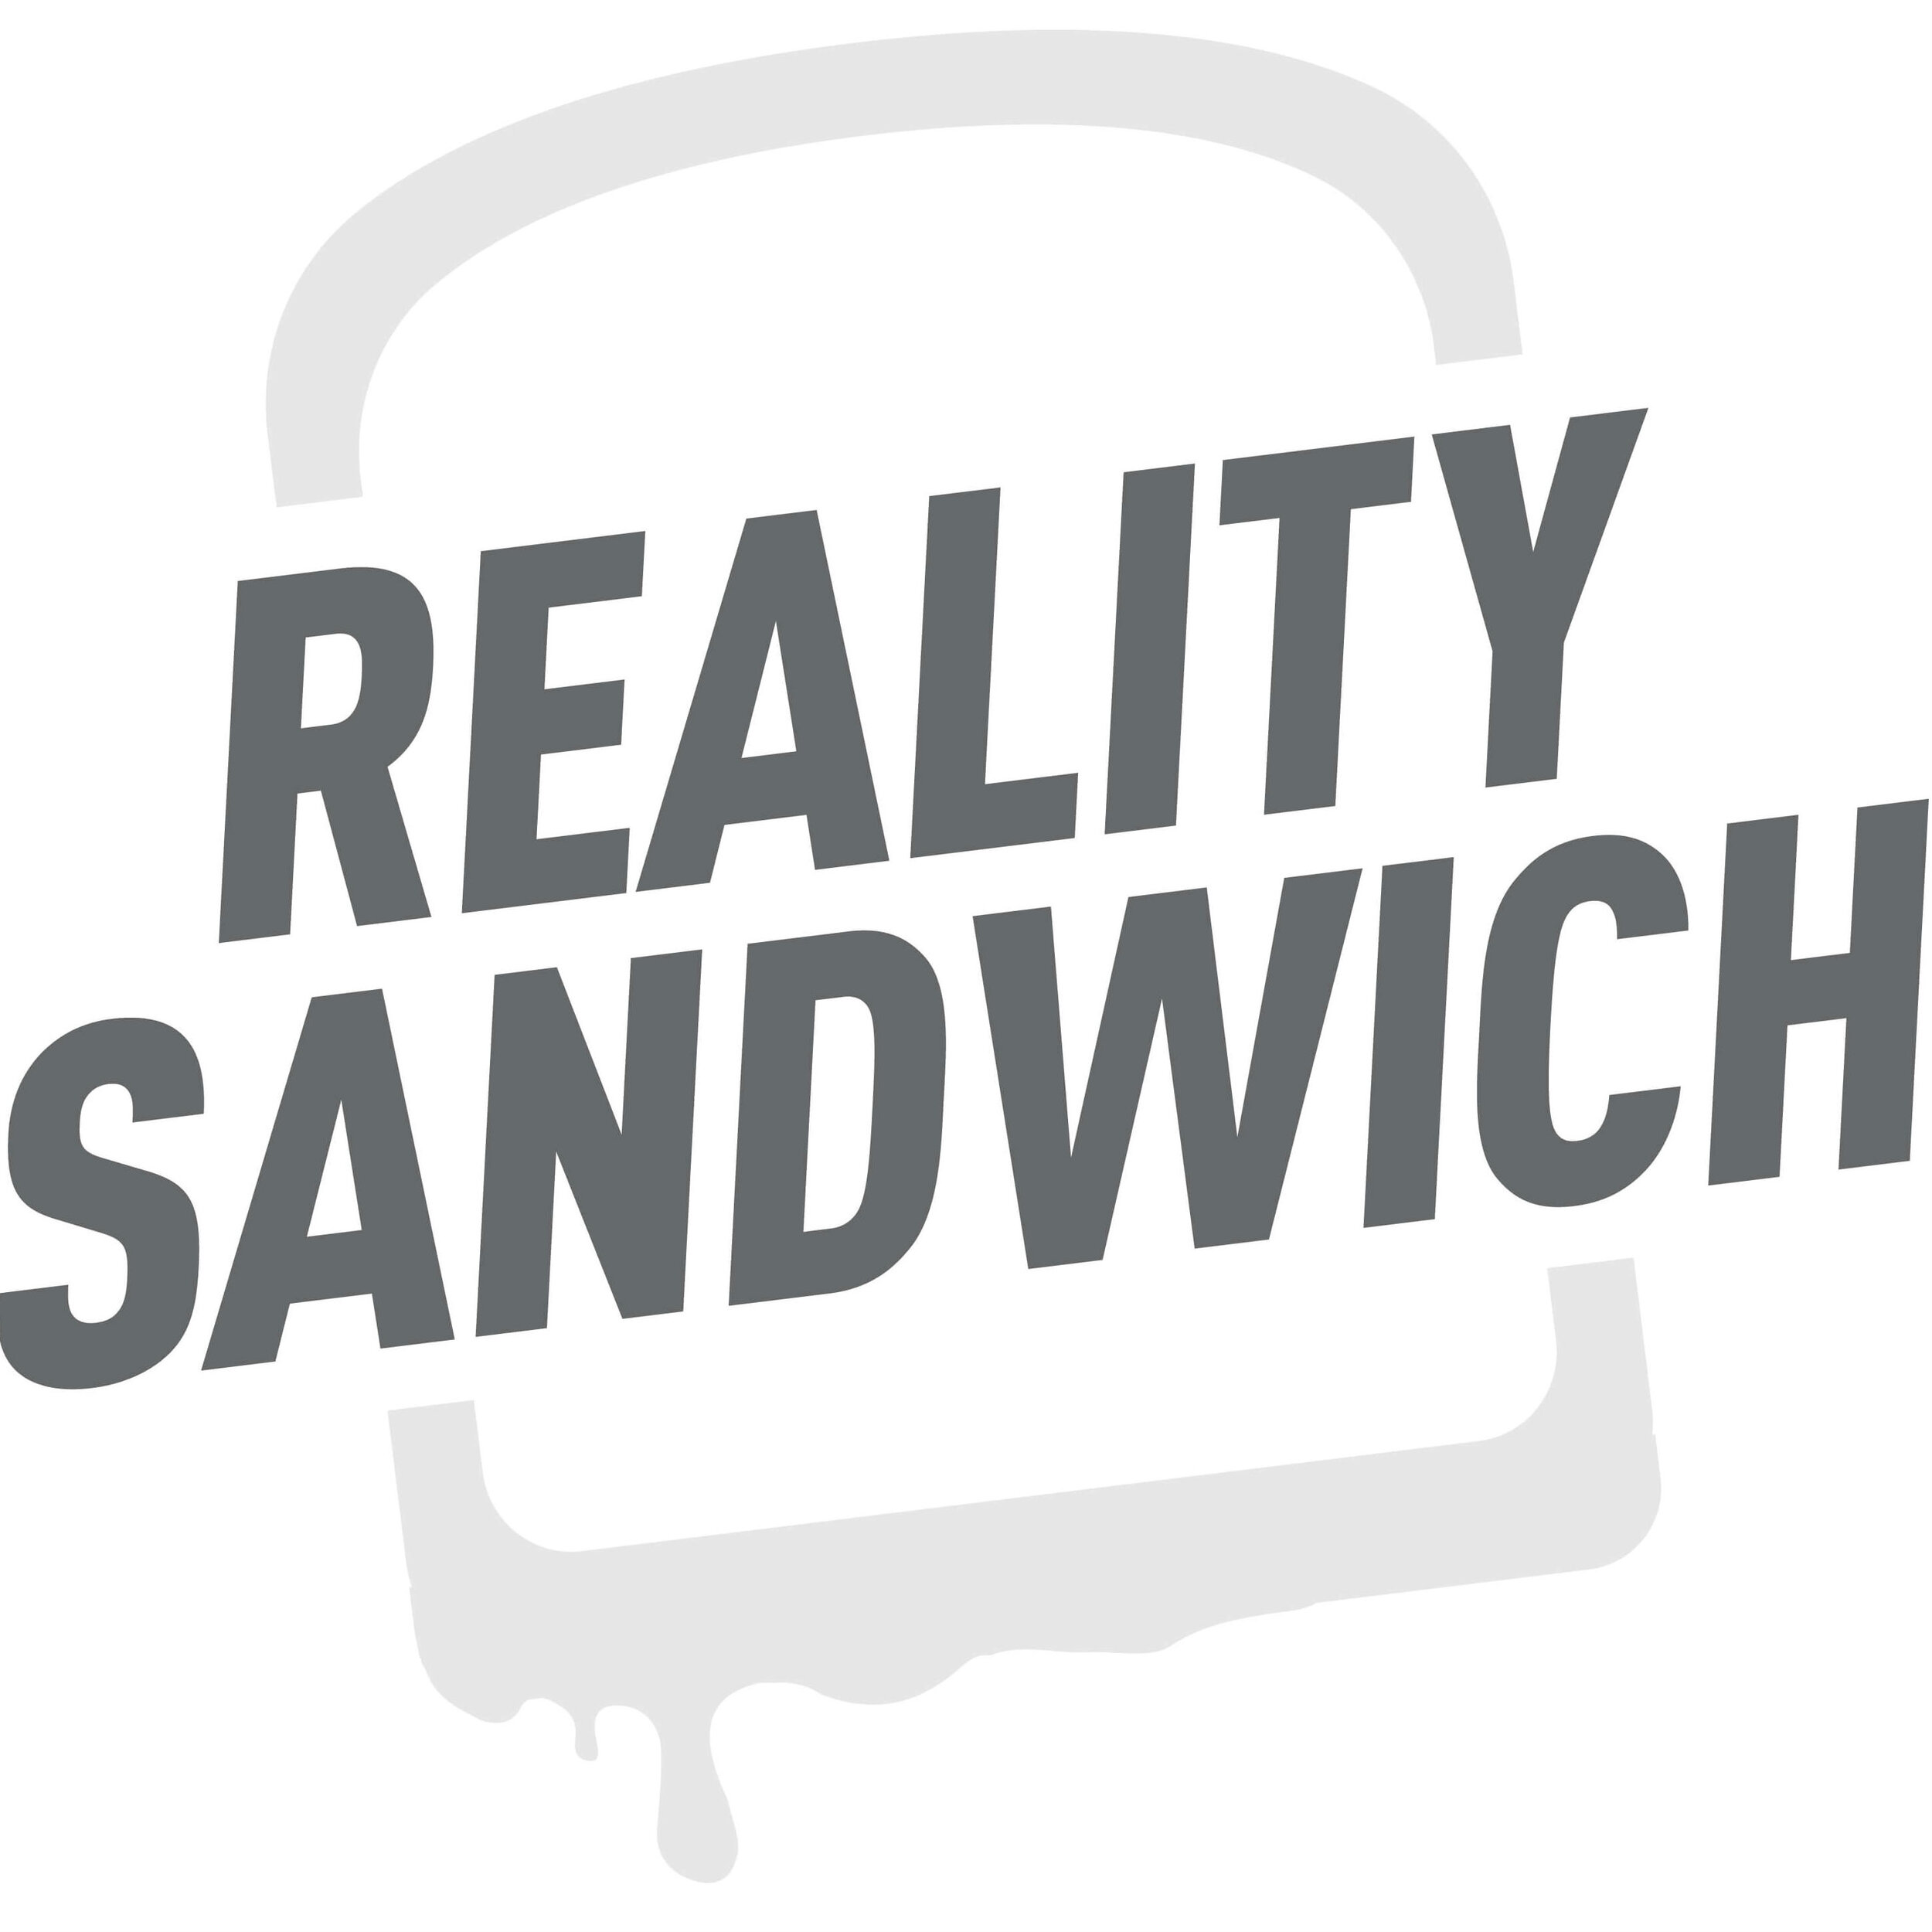 Reality-Sandwich__Logo__BW.jpg